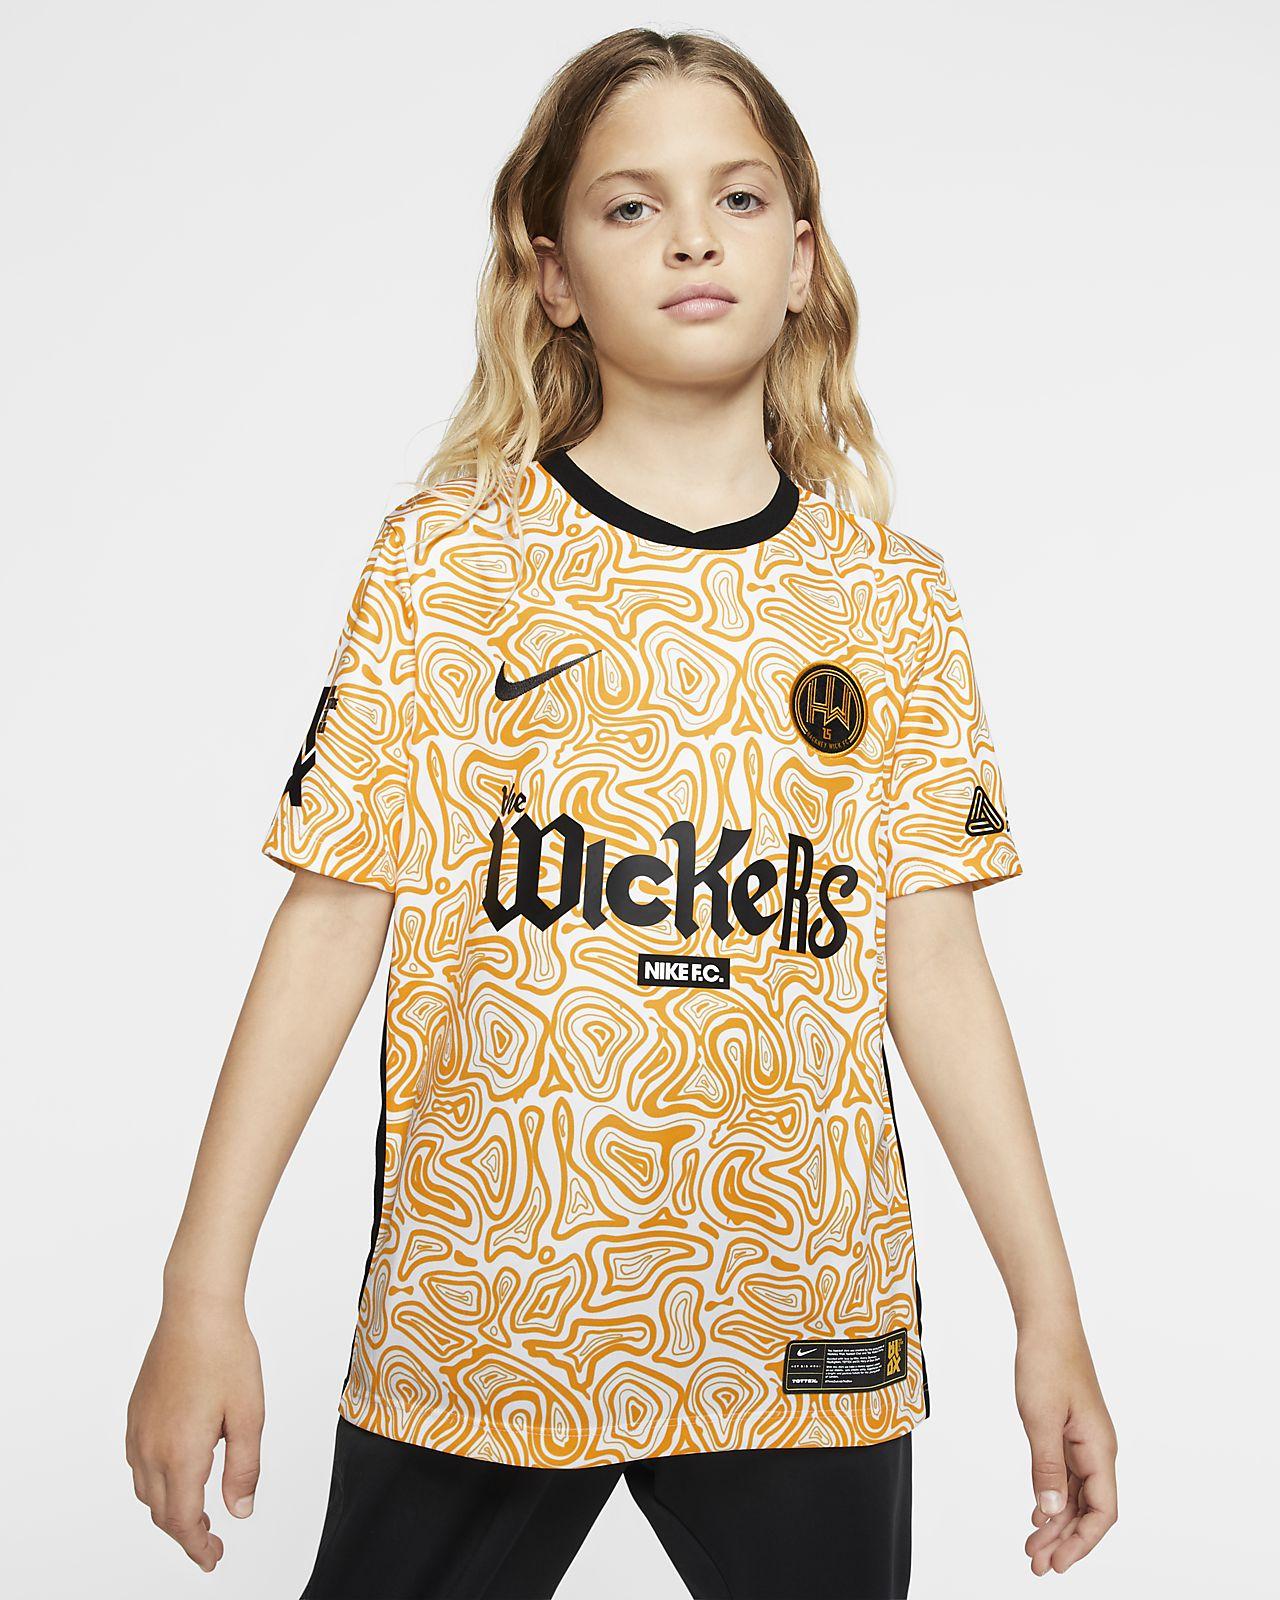 Hackney Wick FC Away futballmez nagyobb gyerekeknek